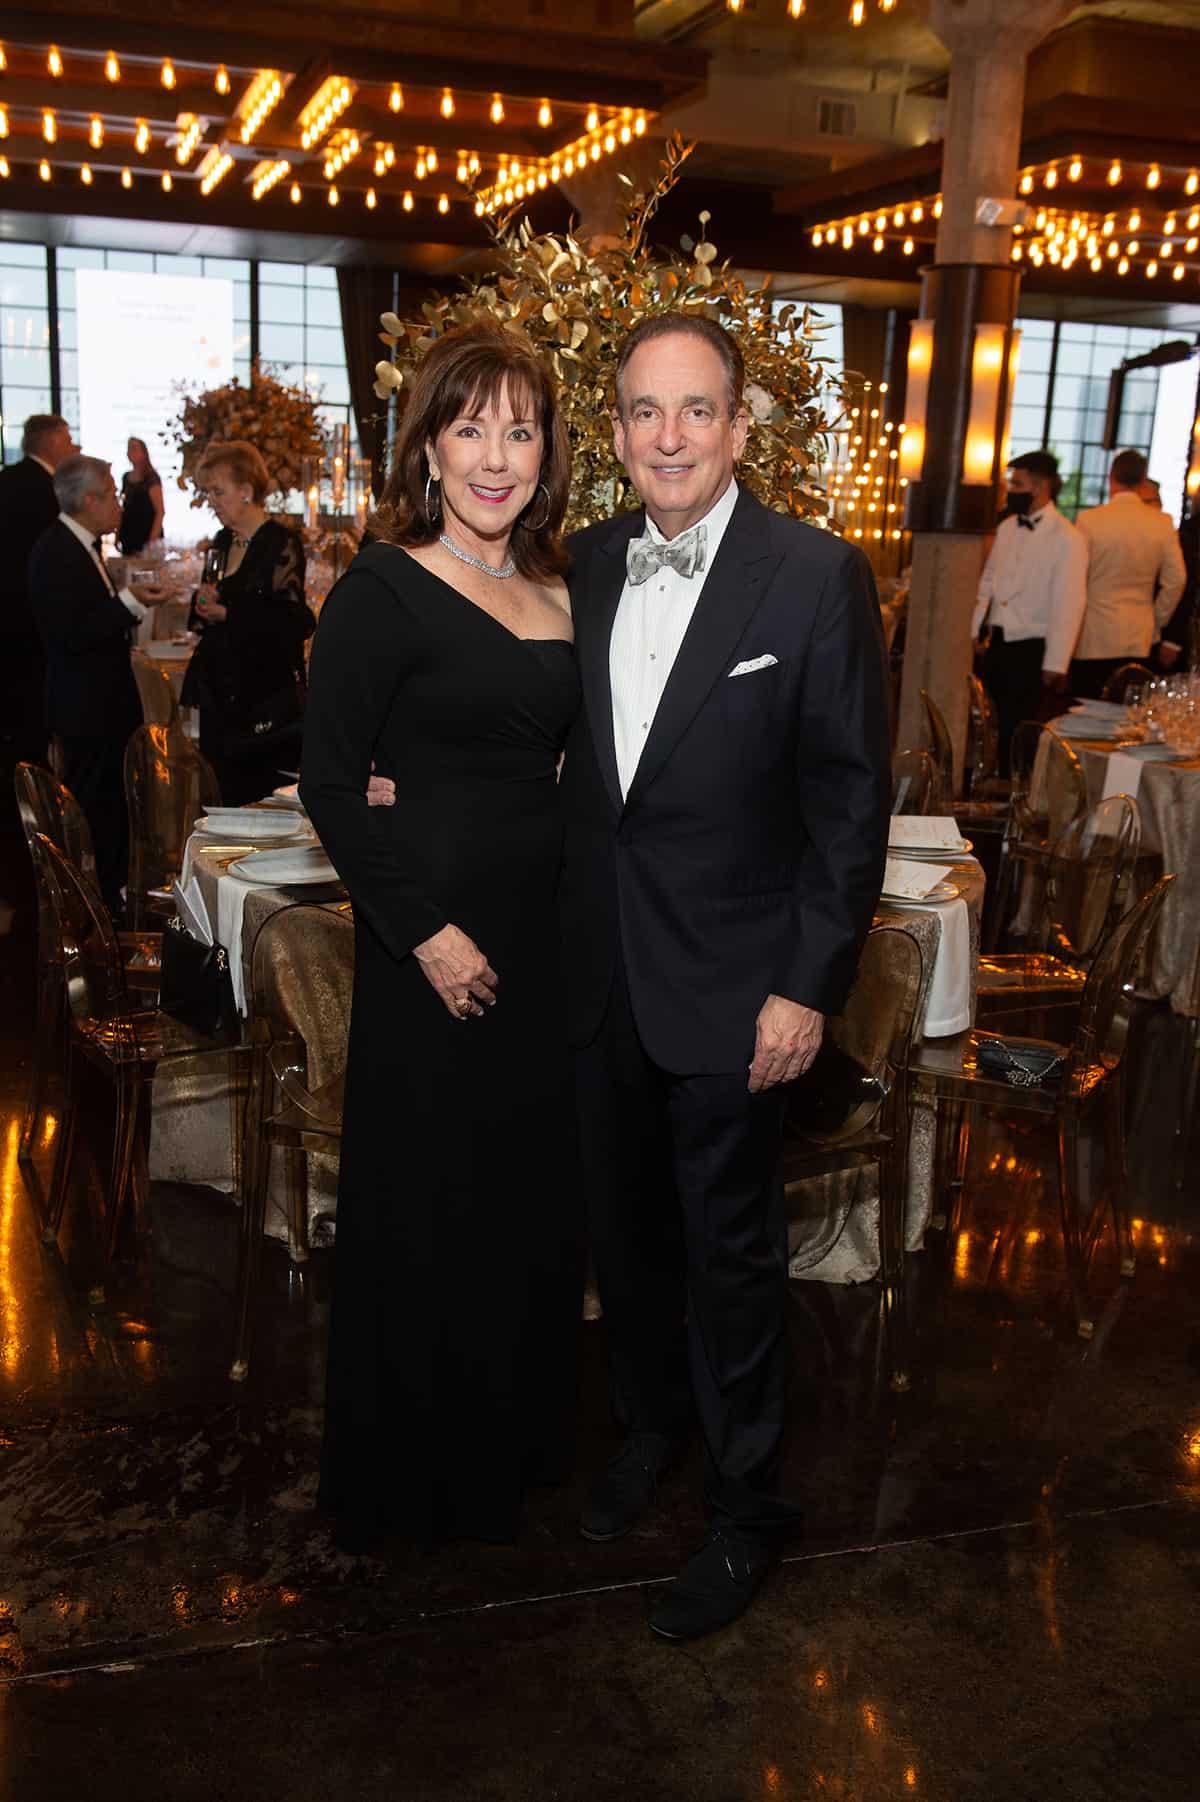 Elizabeth and Alan Stein